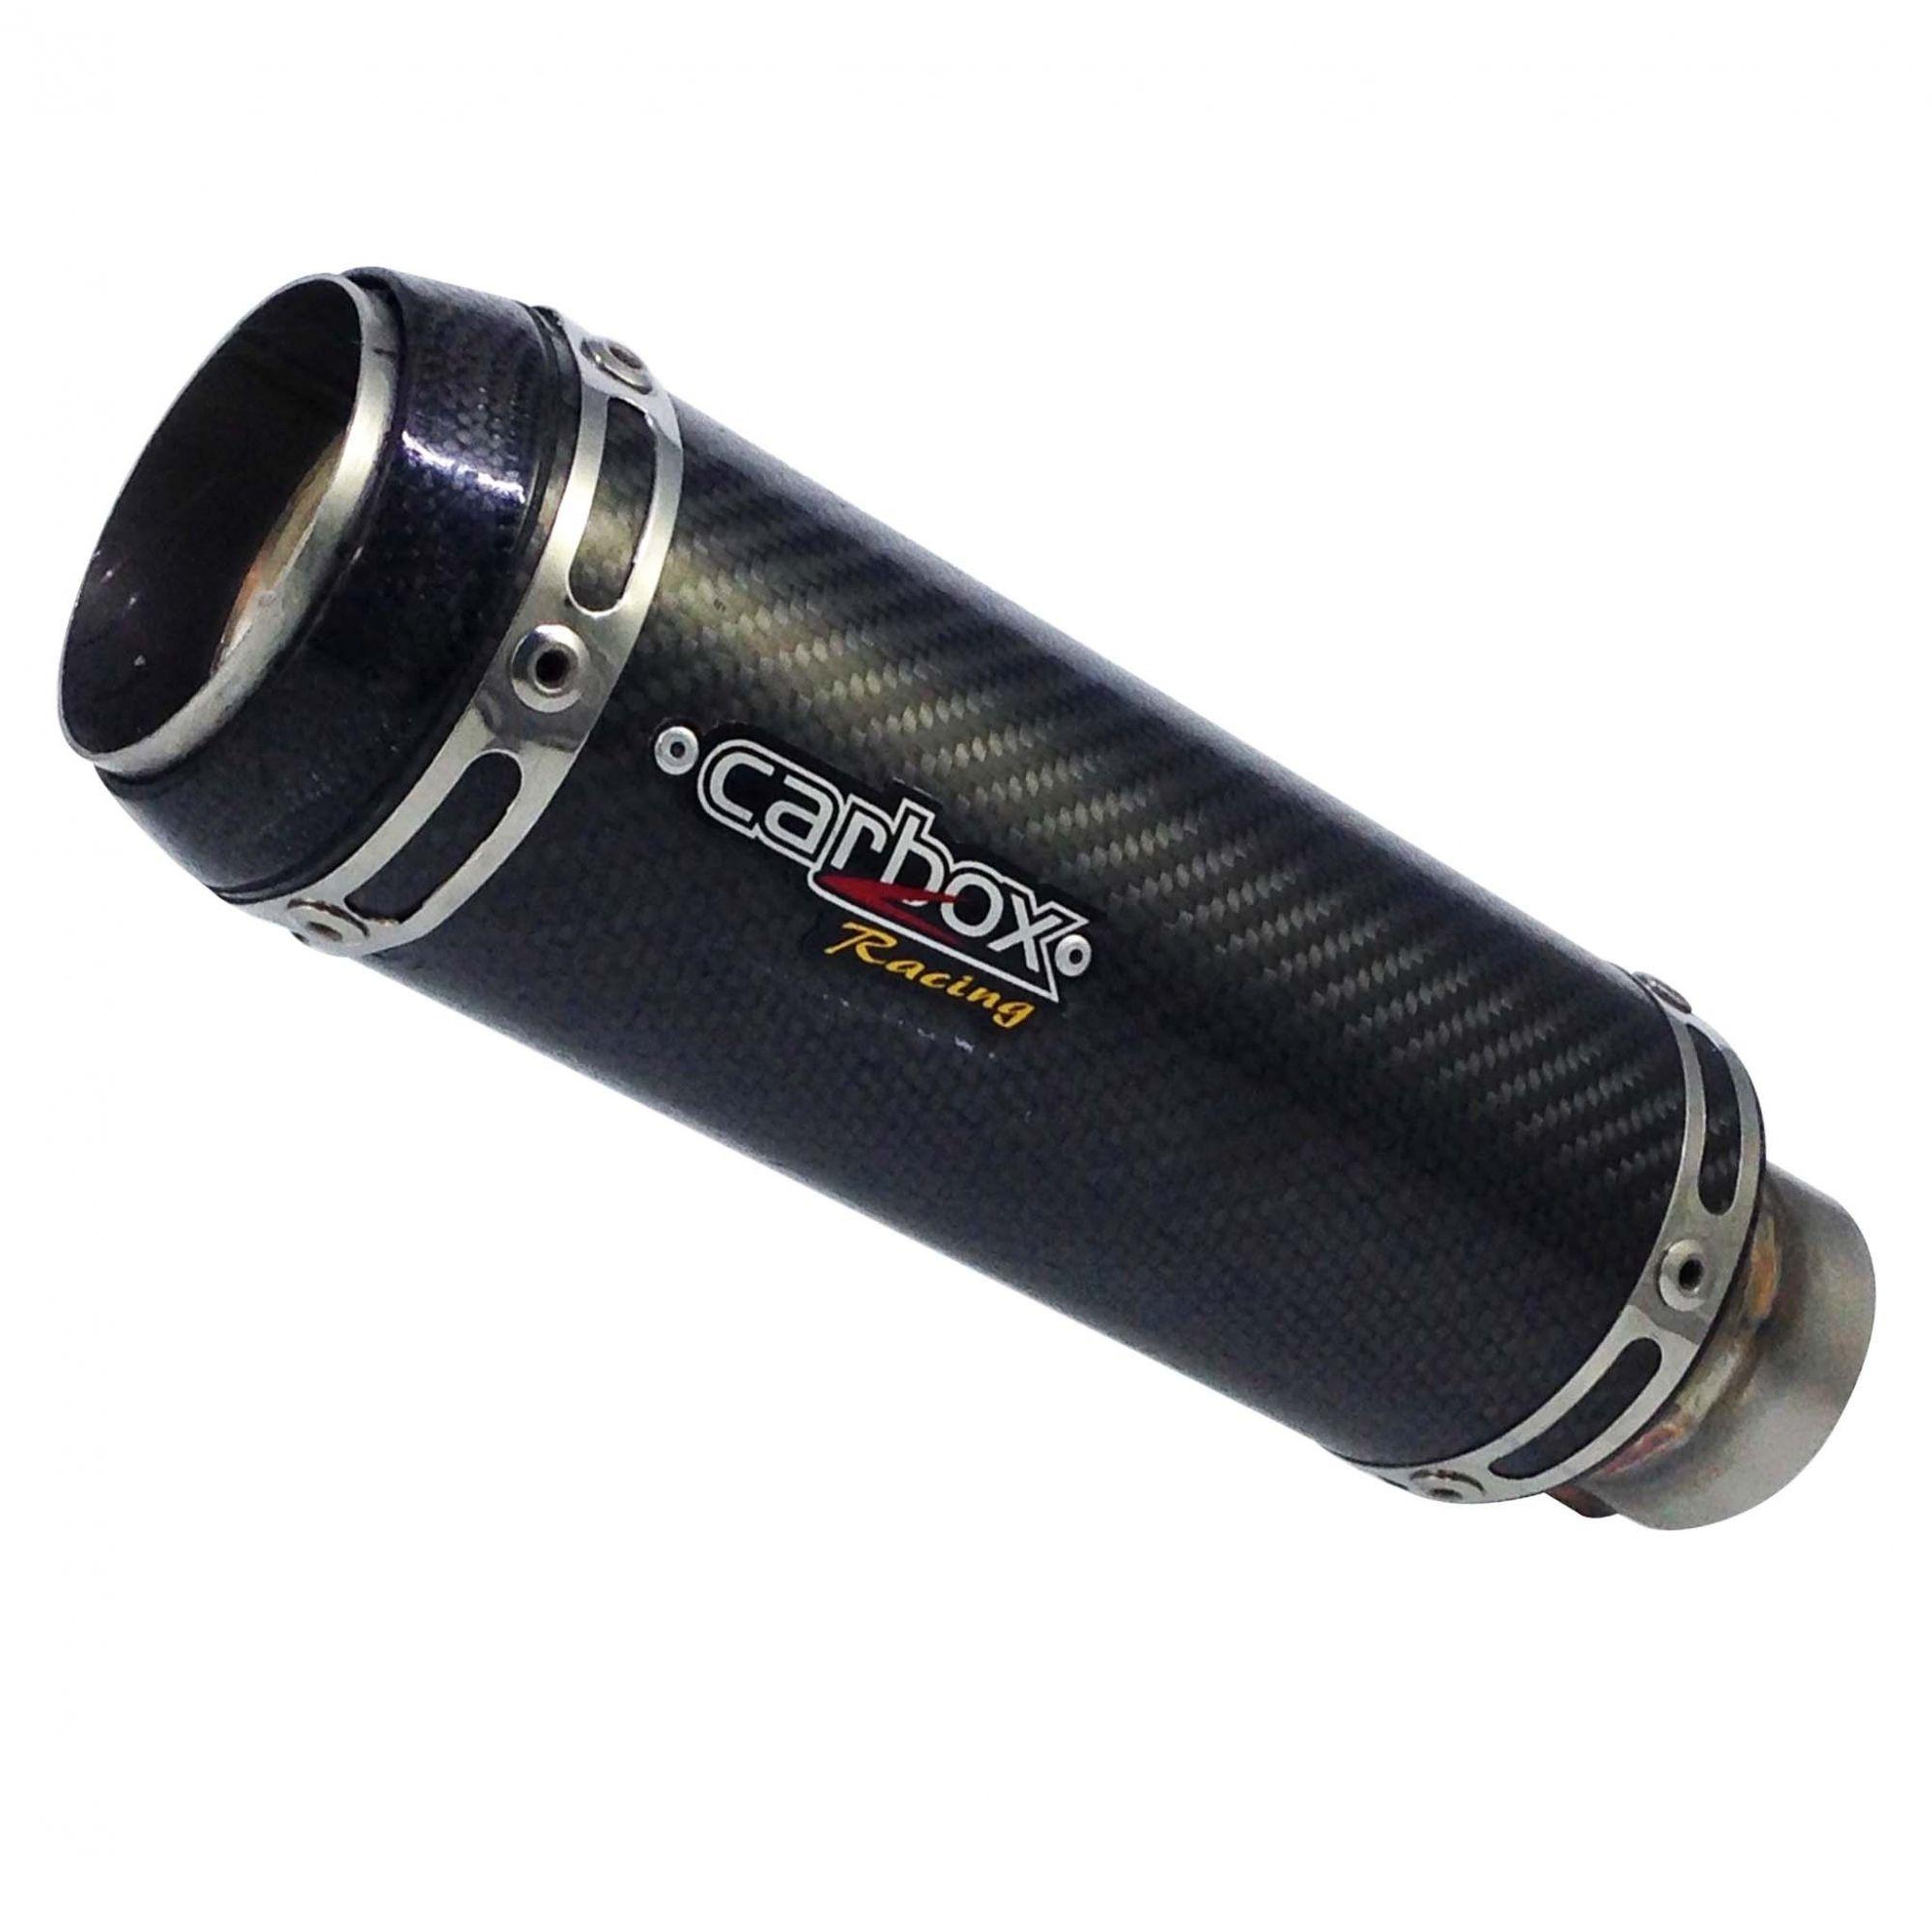 Ponteira Esportiva Gp Tech Carbon Zx6r 12 14 Carbox Racing